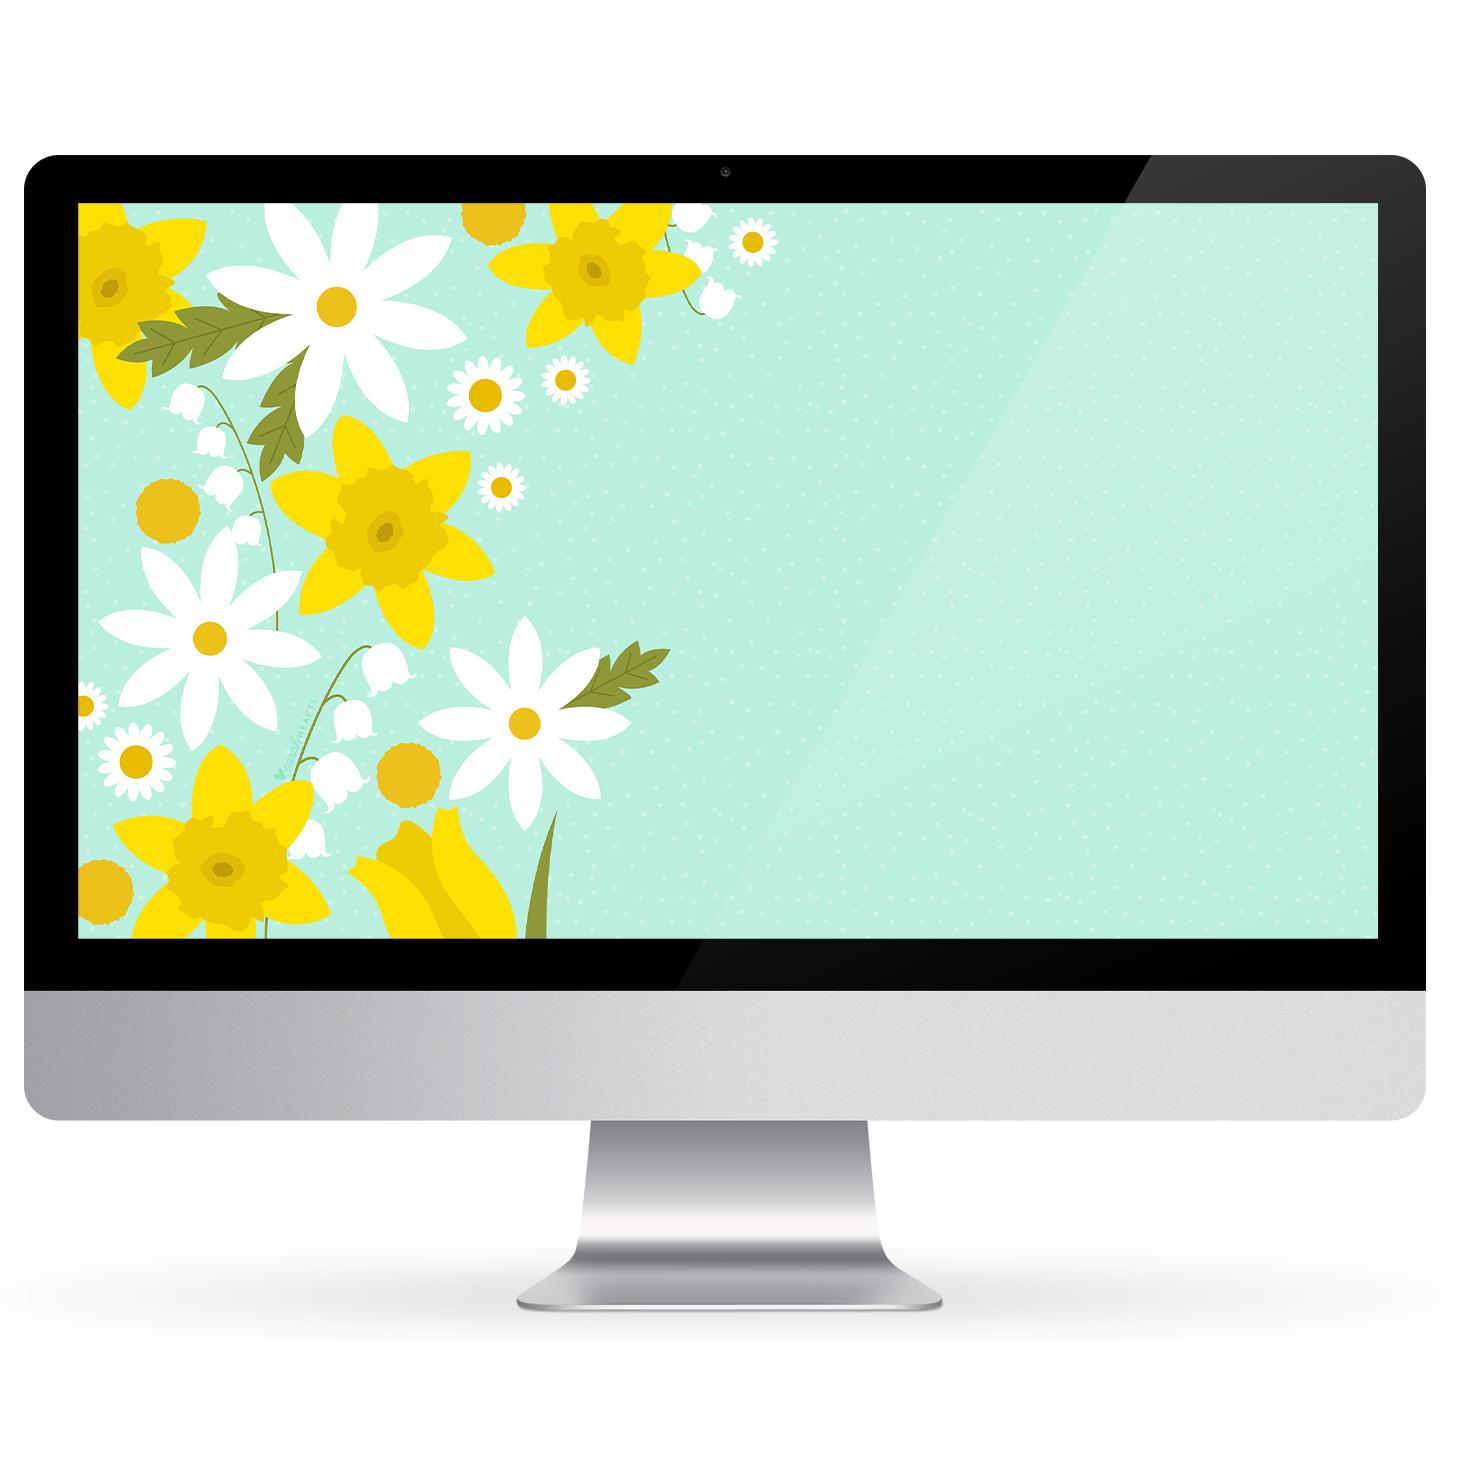 Swell March 2018 Spring Flower Calendar Wallpaper Sarah Hearts Download Free Architecture Designs Xoliawazosbritishbridgeorg